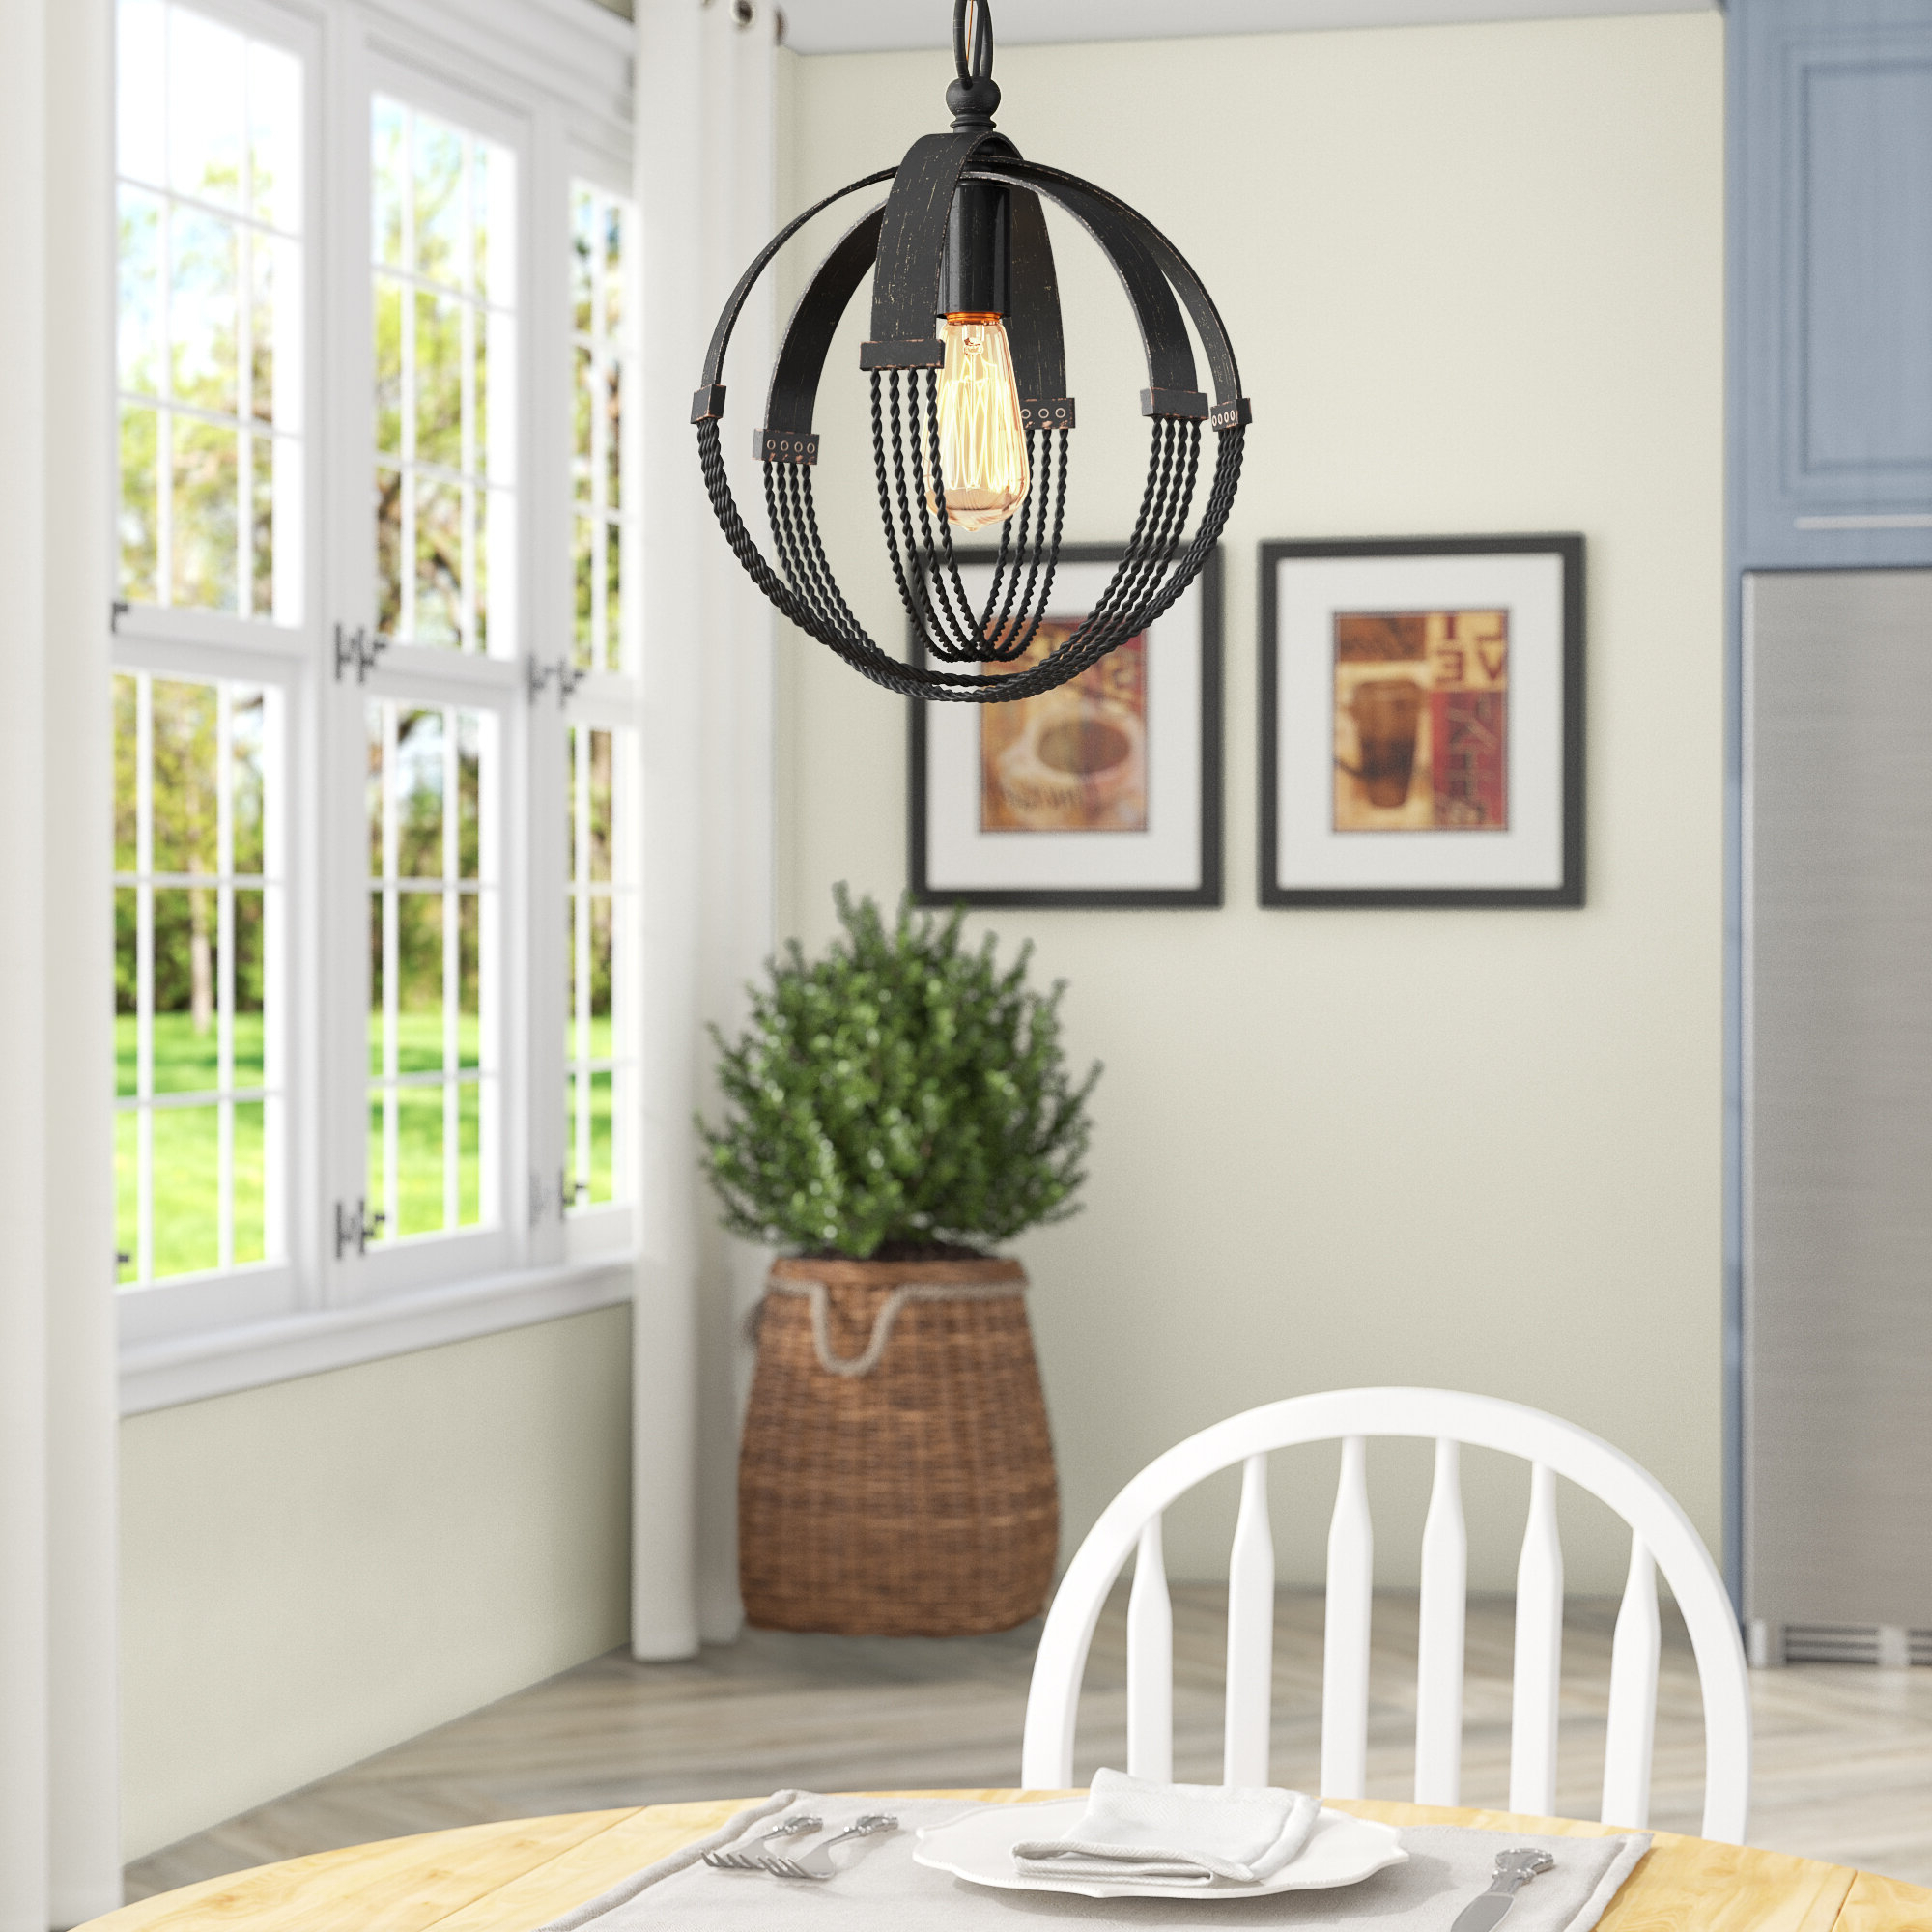 Newest Branscome 1 Light Single Globe Pendant Inside Prange 1 Light Single Globe Pendants (Gallery 9 of 20)